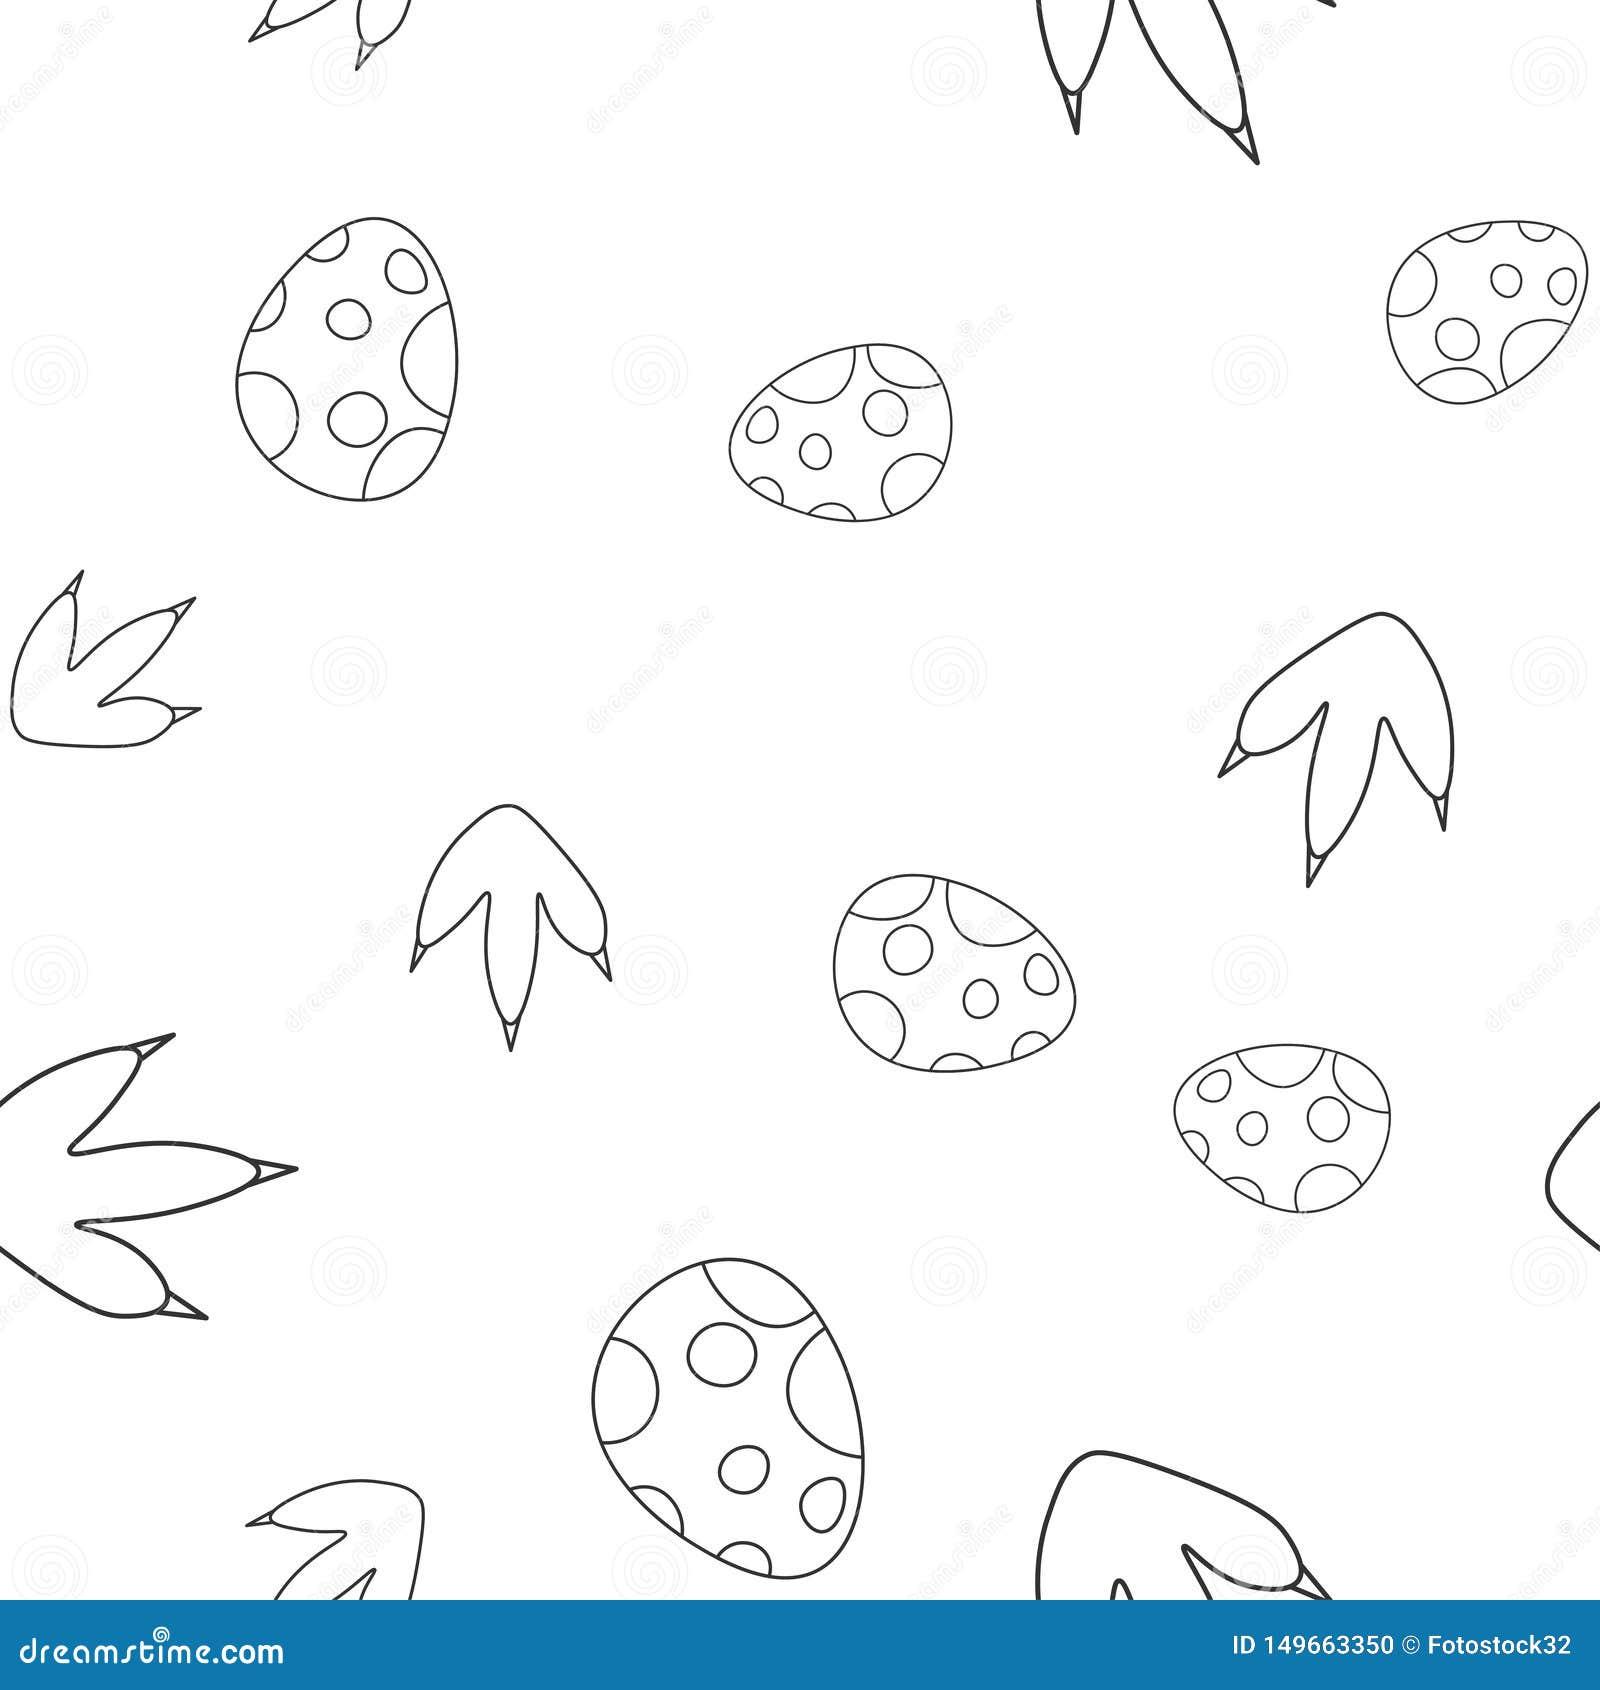 Dinosaur egg and footprint seamless pattern